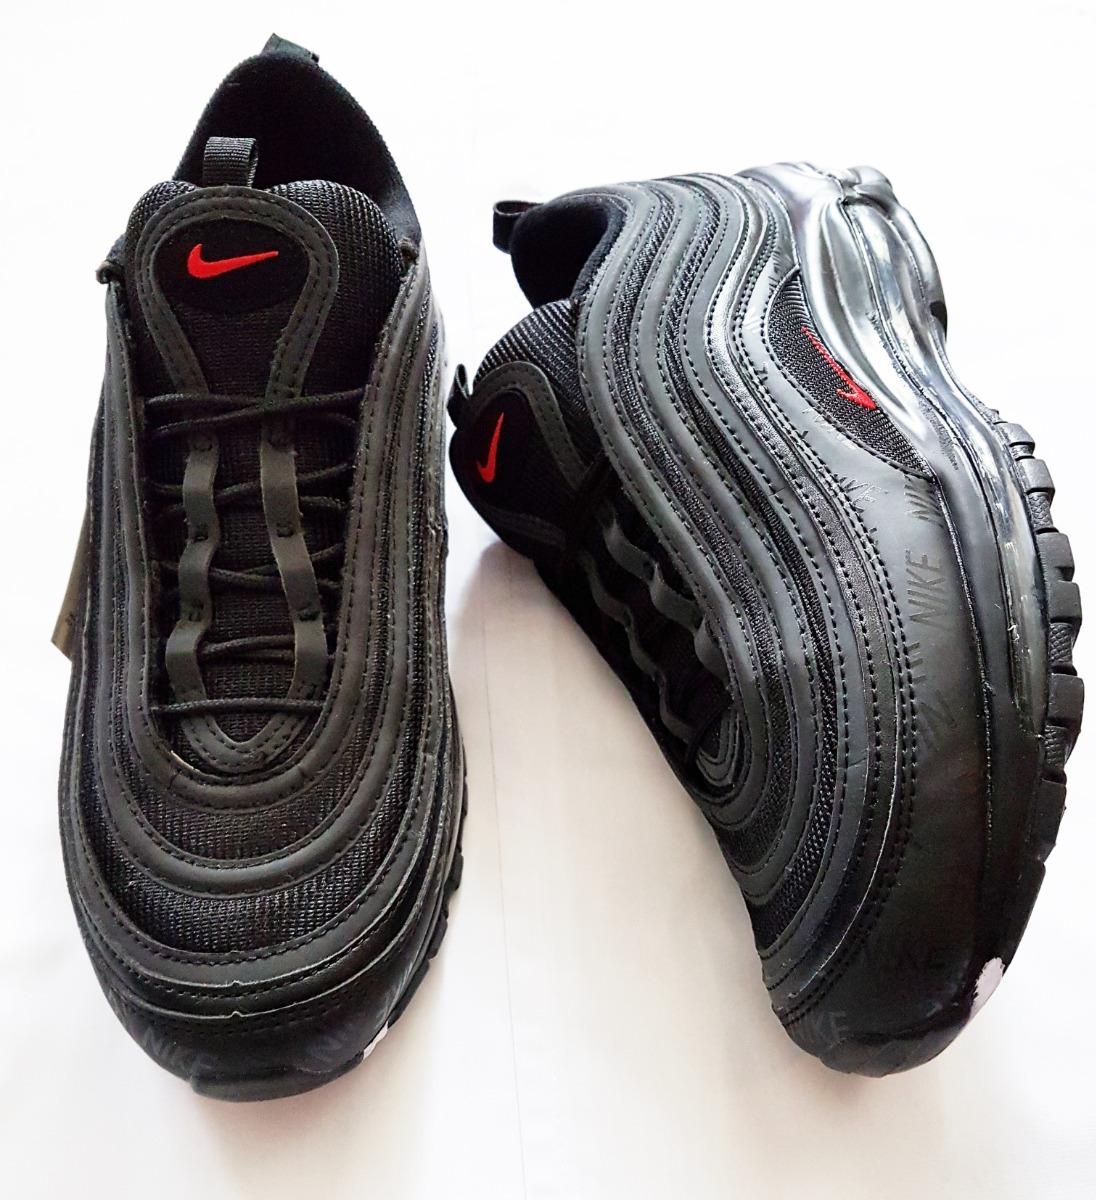 119b27b00 Botas Nike Air Max 97 Oferta 40 - Bs. 6.500